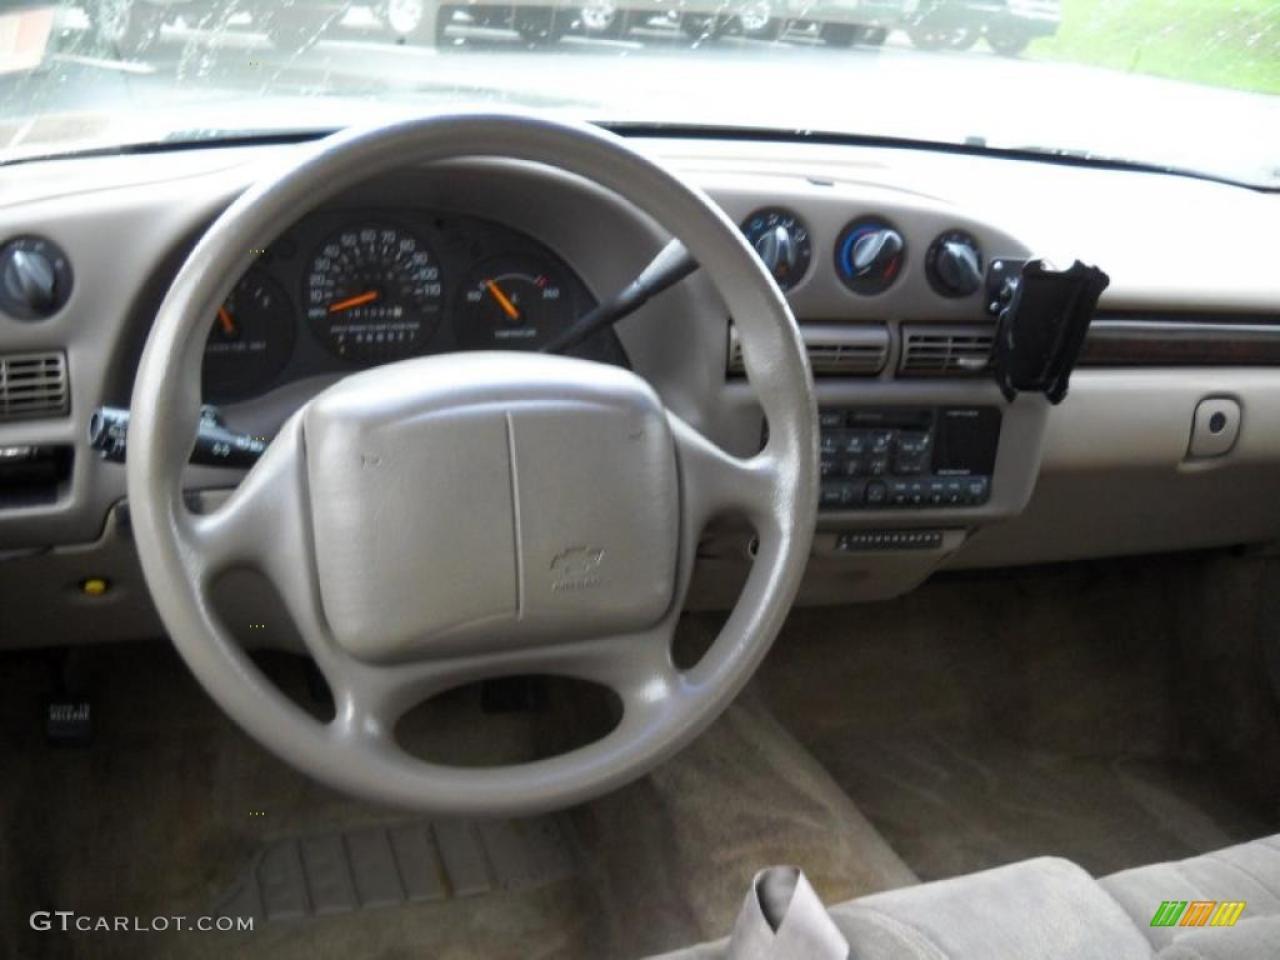 800 1024 1280 1600 Origin 1998 Chevrolet Lumina